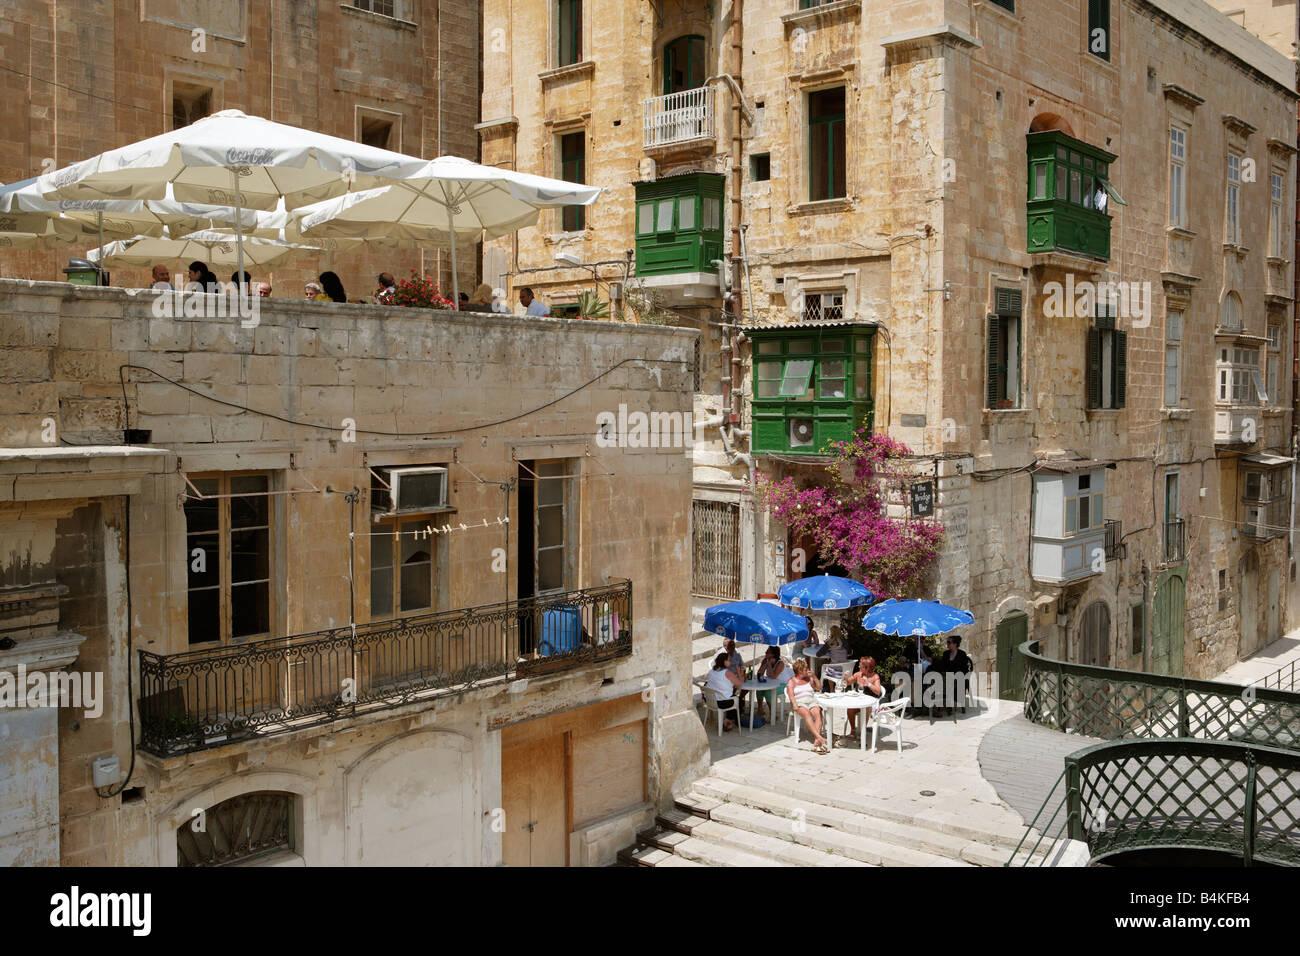 Alfresco dining, Valletta, Malta - Stock Image